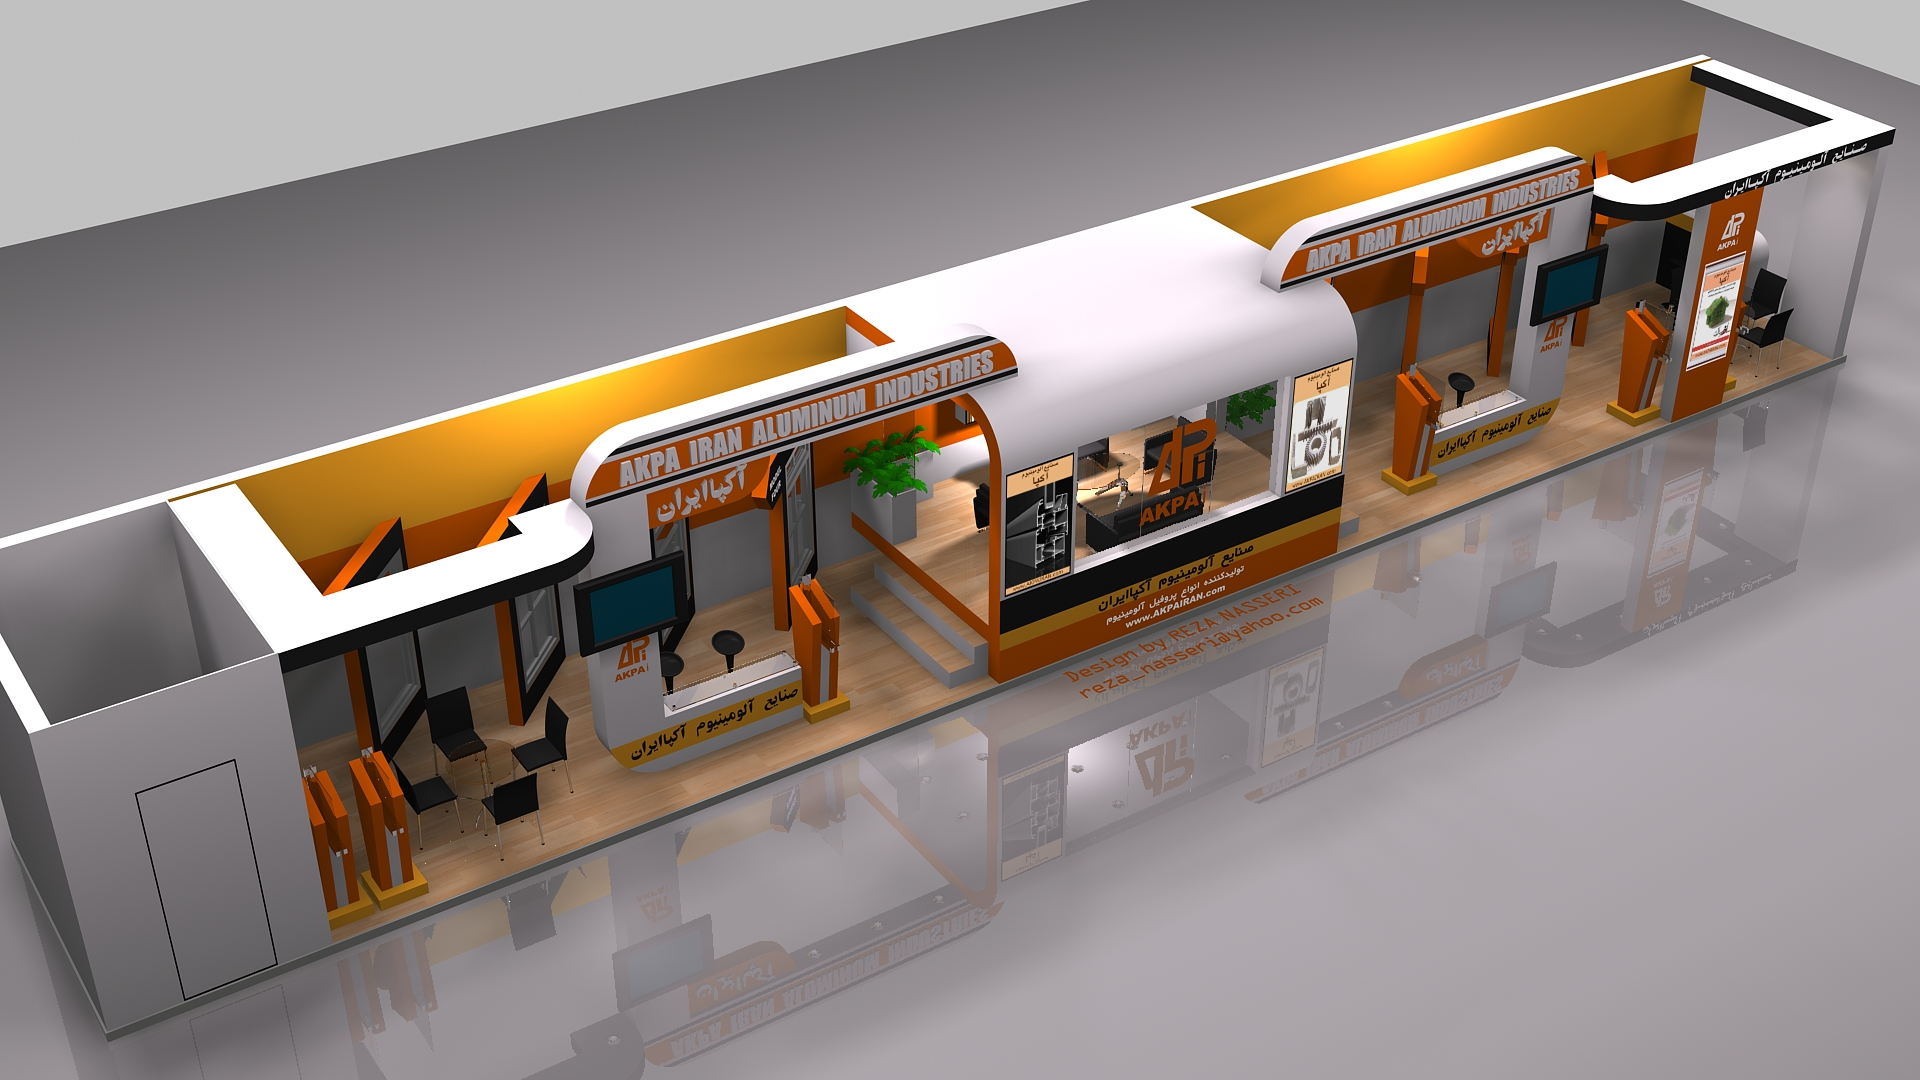 D Exhibition Stall Design Full : Akpairan exhibition stall design by reza nas